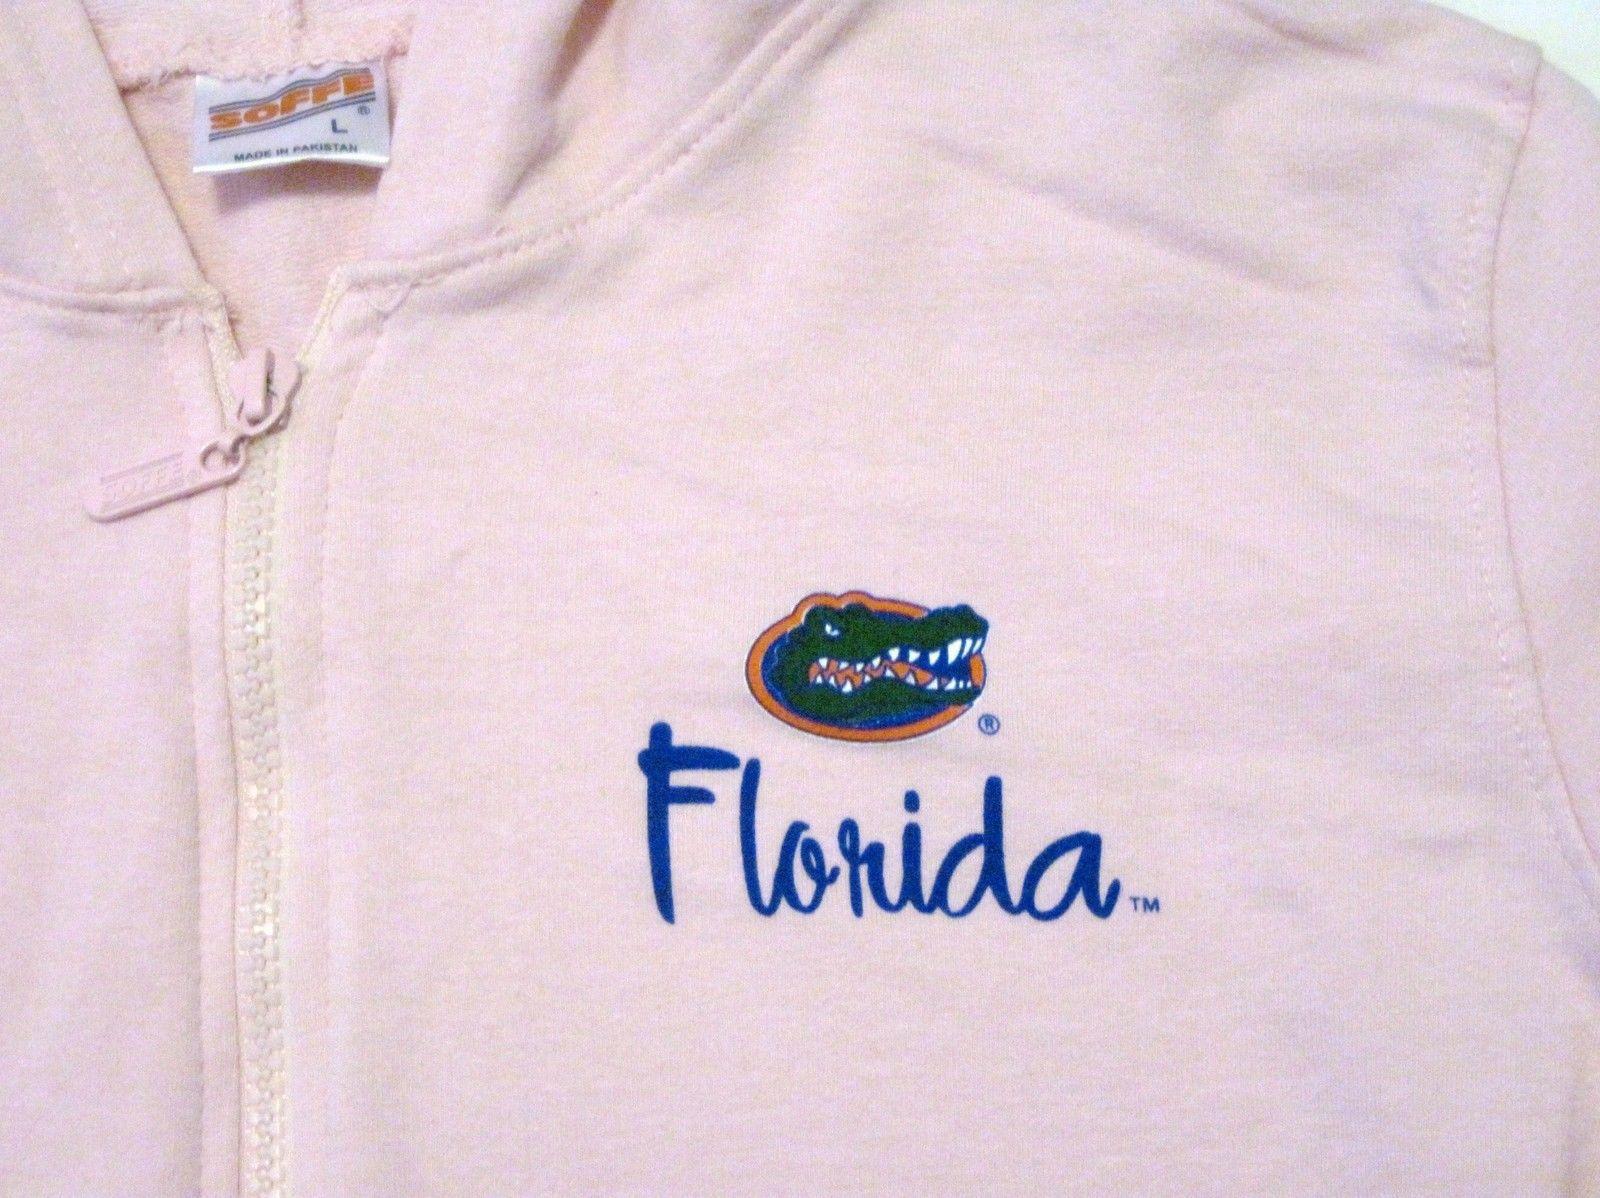 NWT University of Florida UF Gators Hoodie Zipper Jacket Pink Lt Gray by Soffe image 7